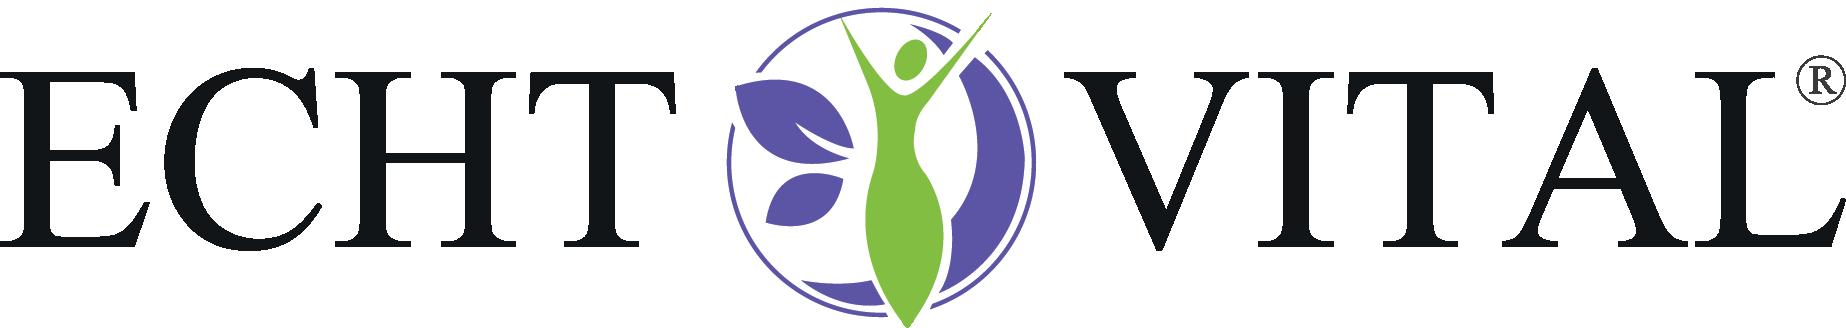 ECHT-VITAL-Logo